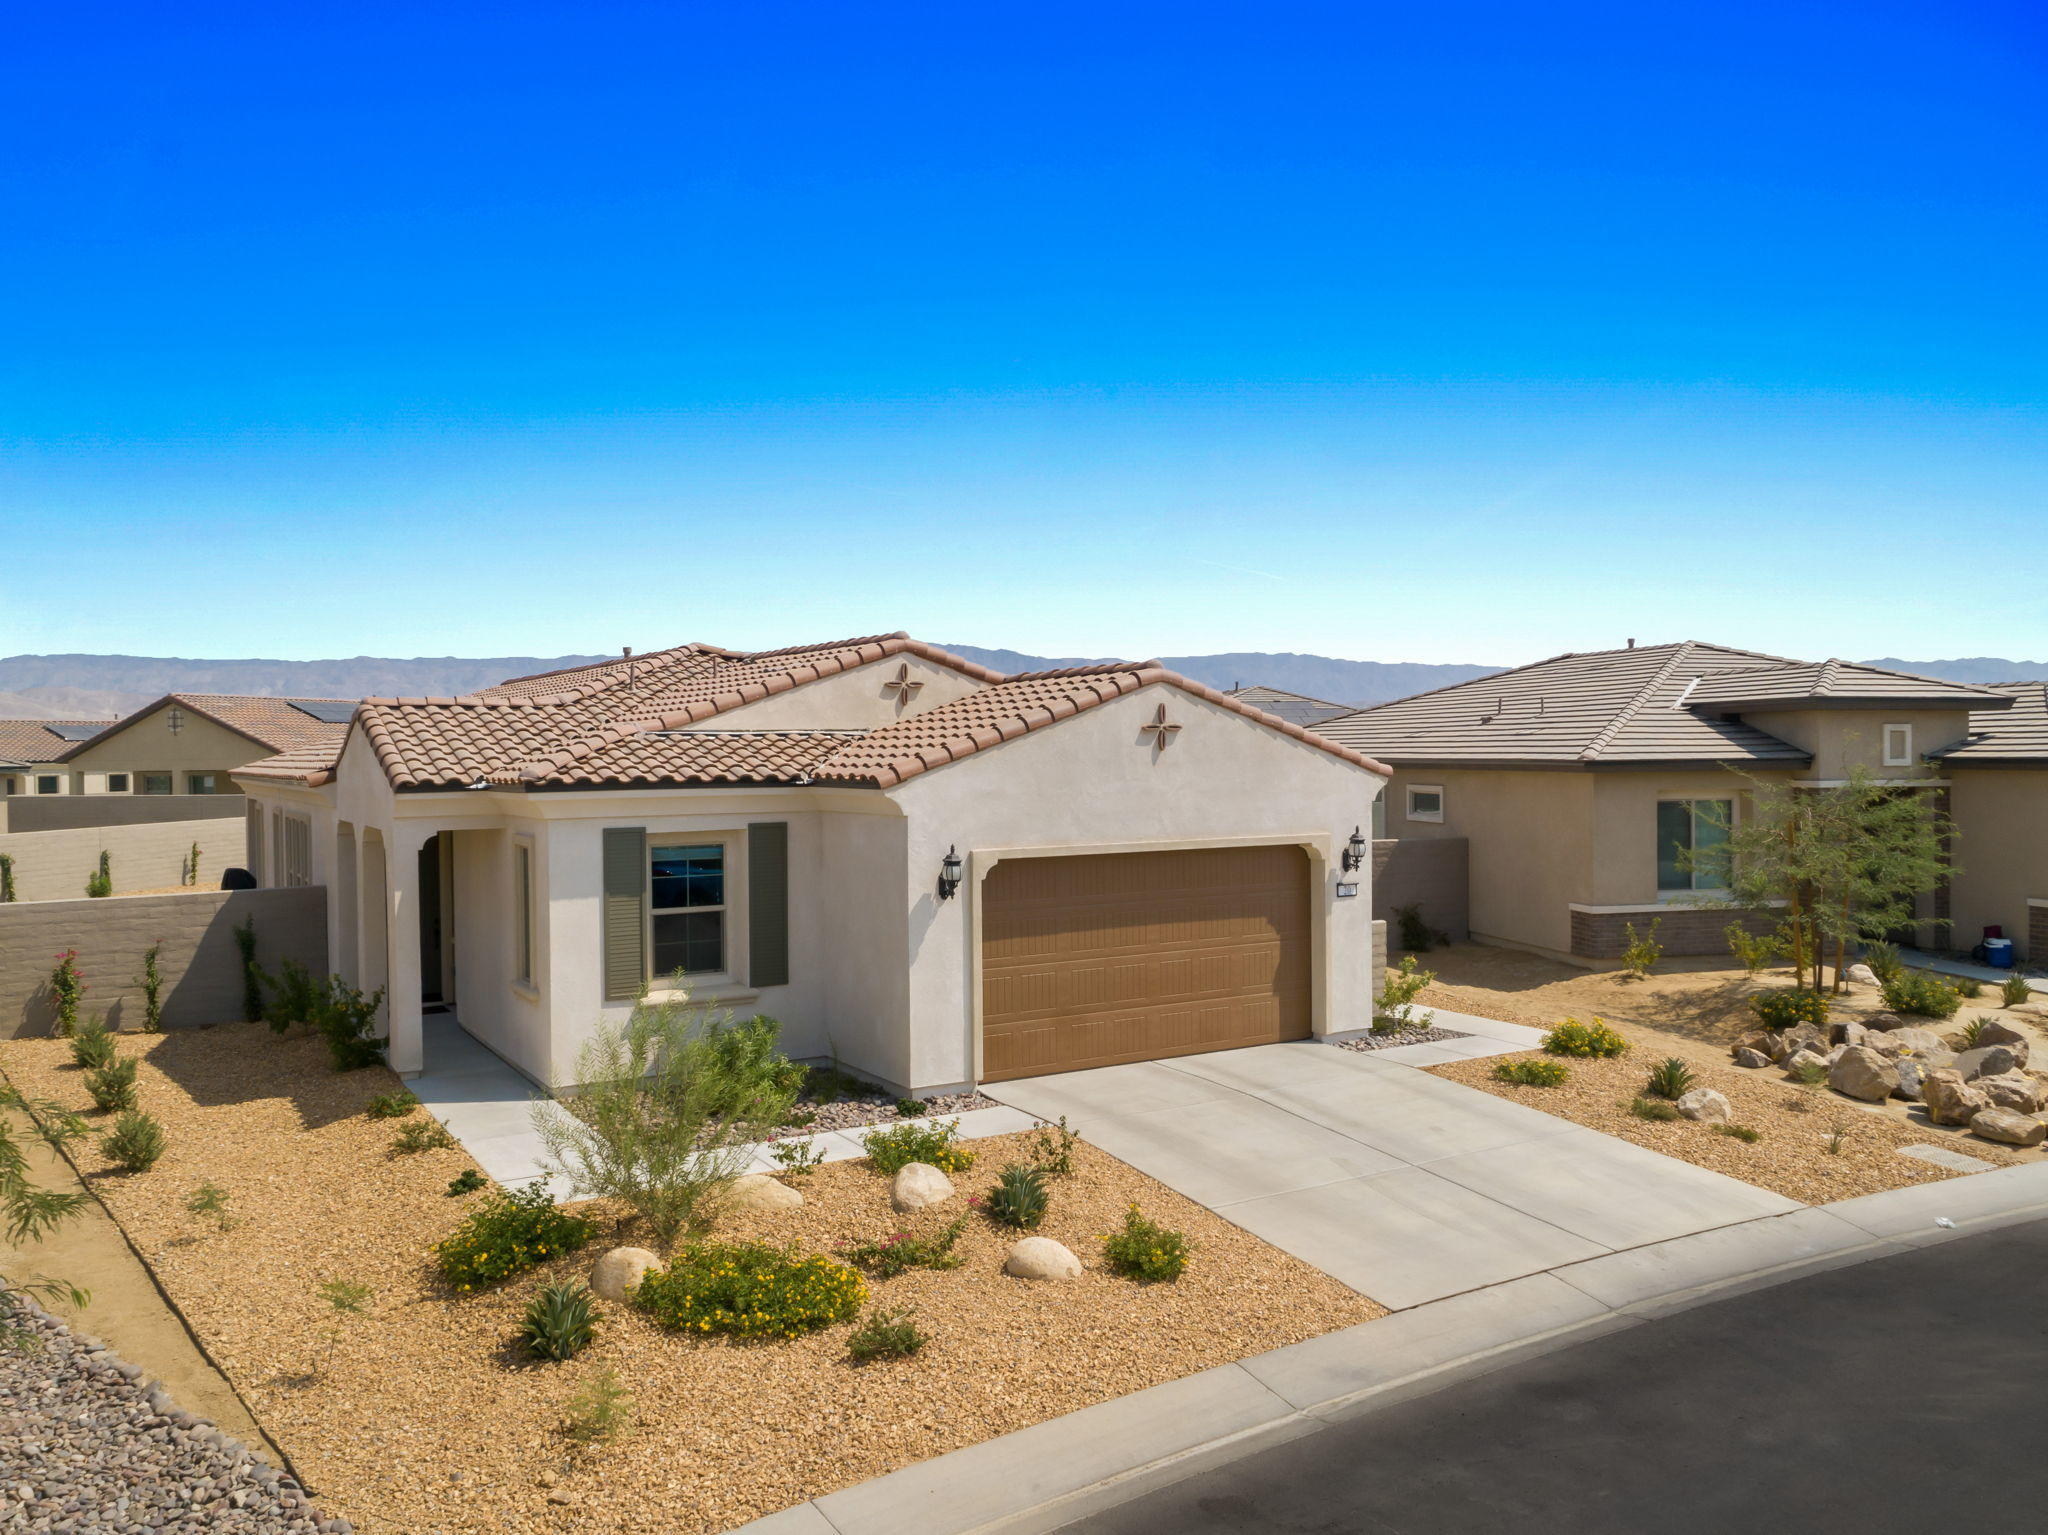 Photo of 20 Bordeaux, Rancho Mirage, CA 92270